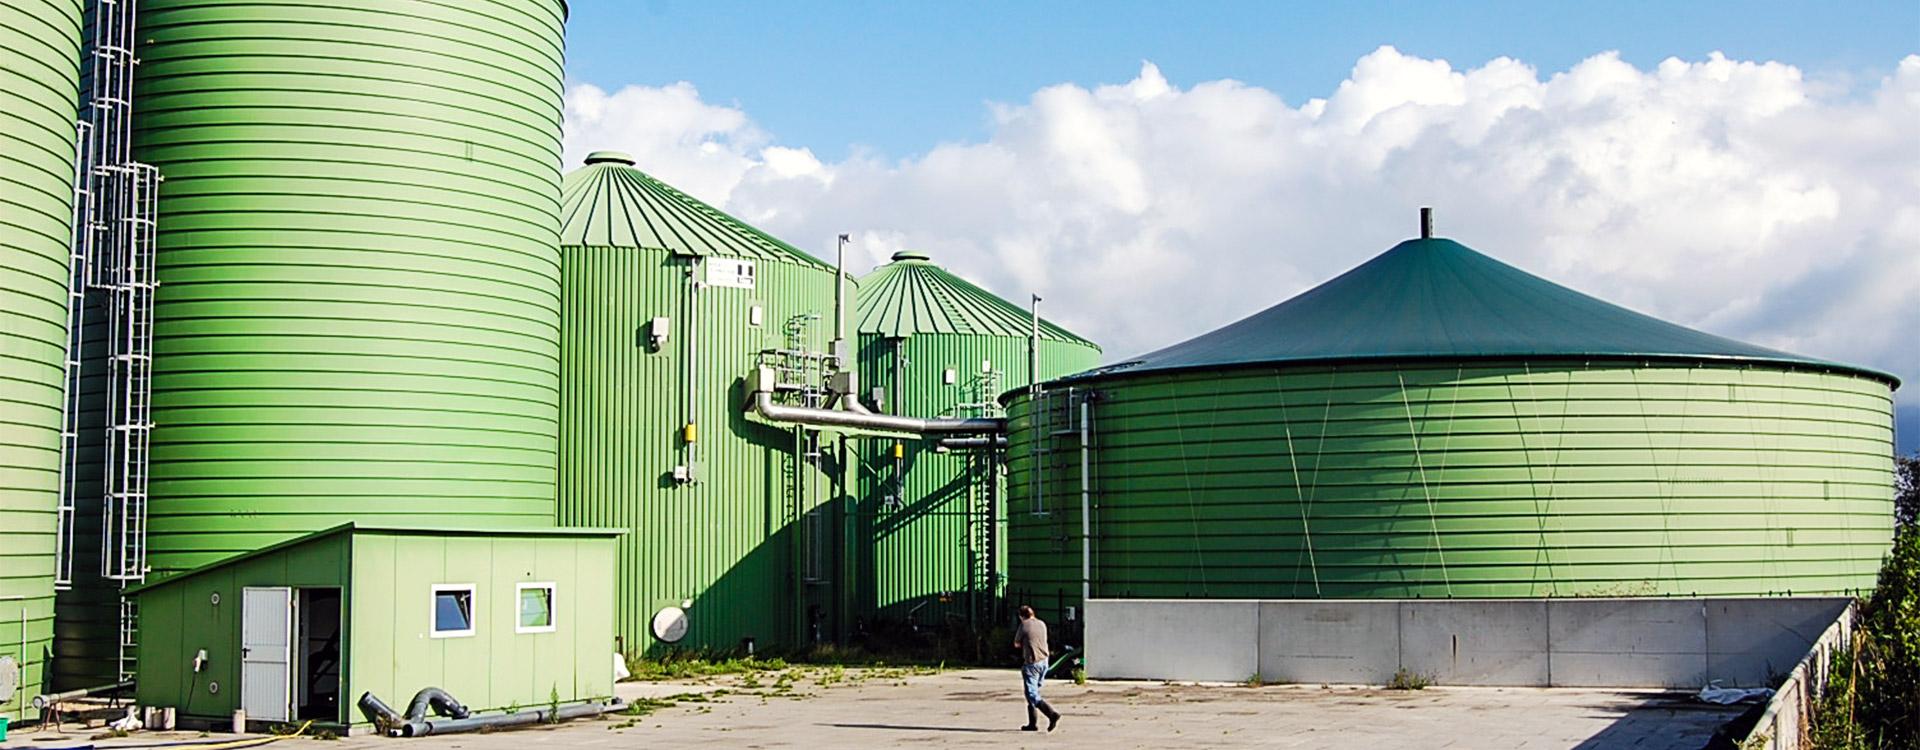 Guelle Landwirtschaft - Lipp System